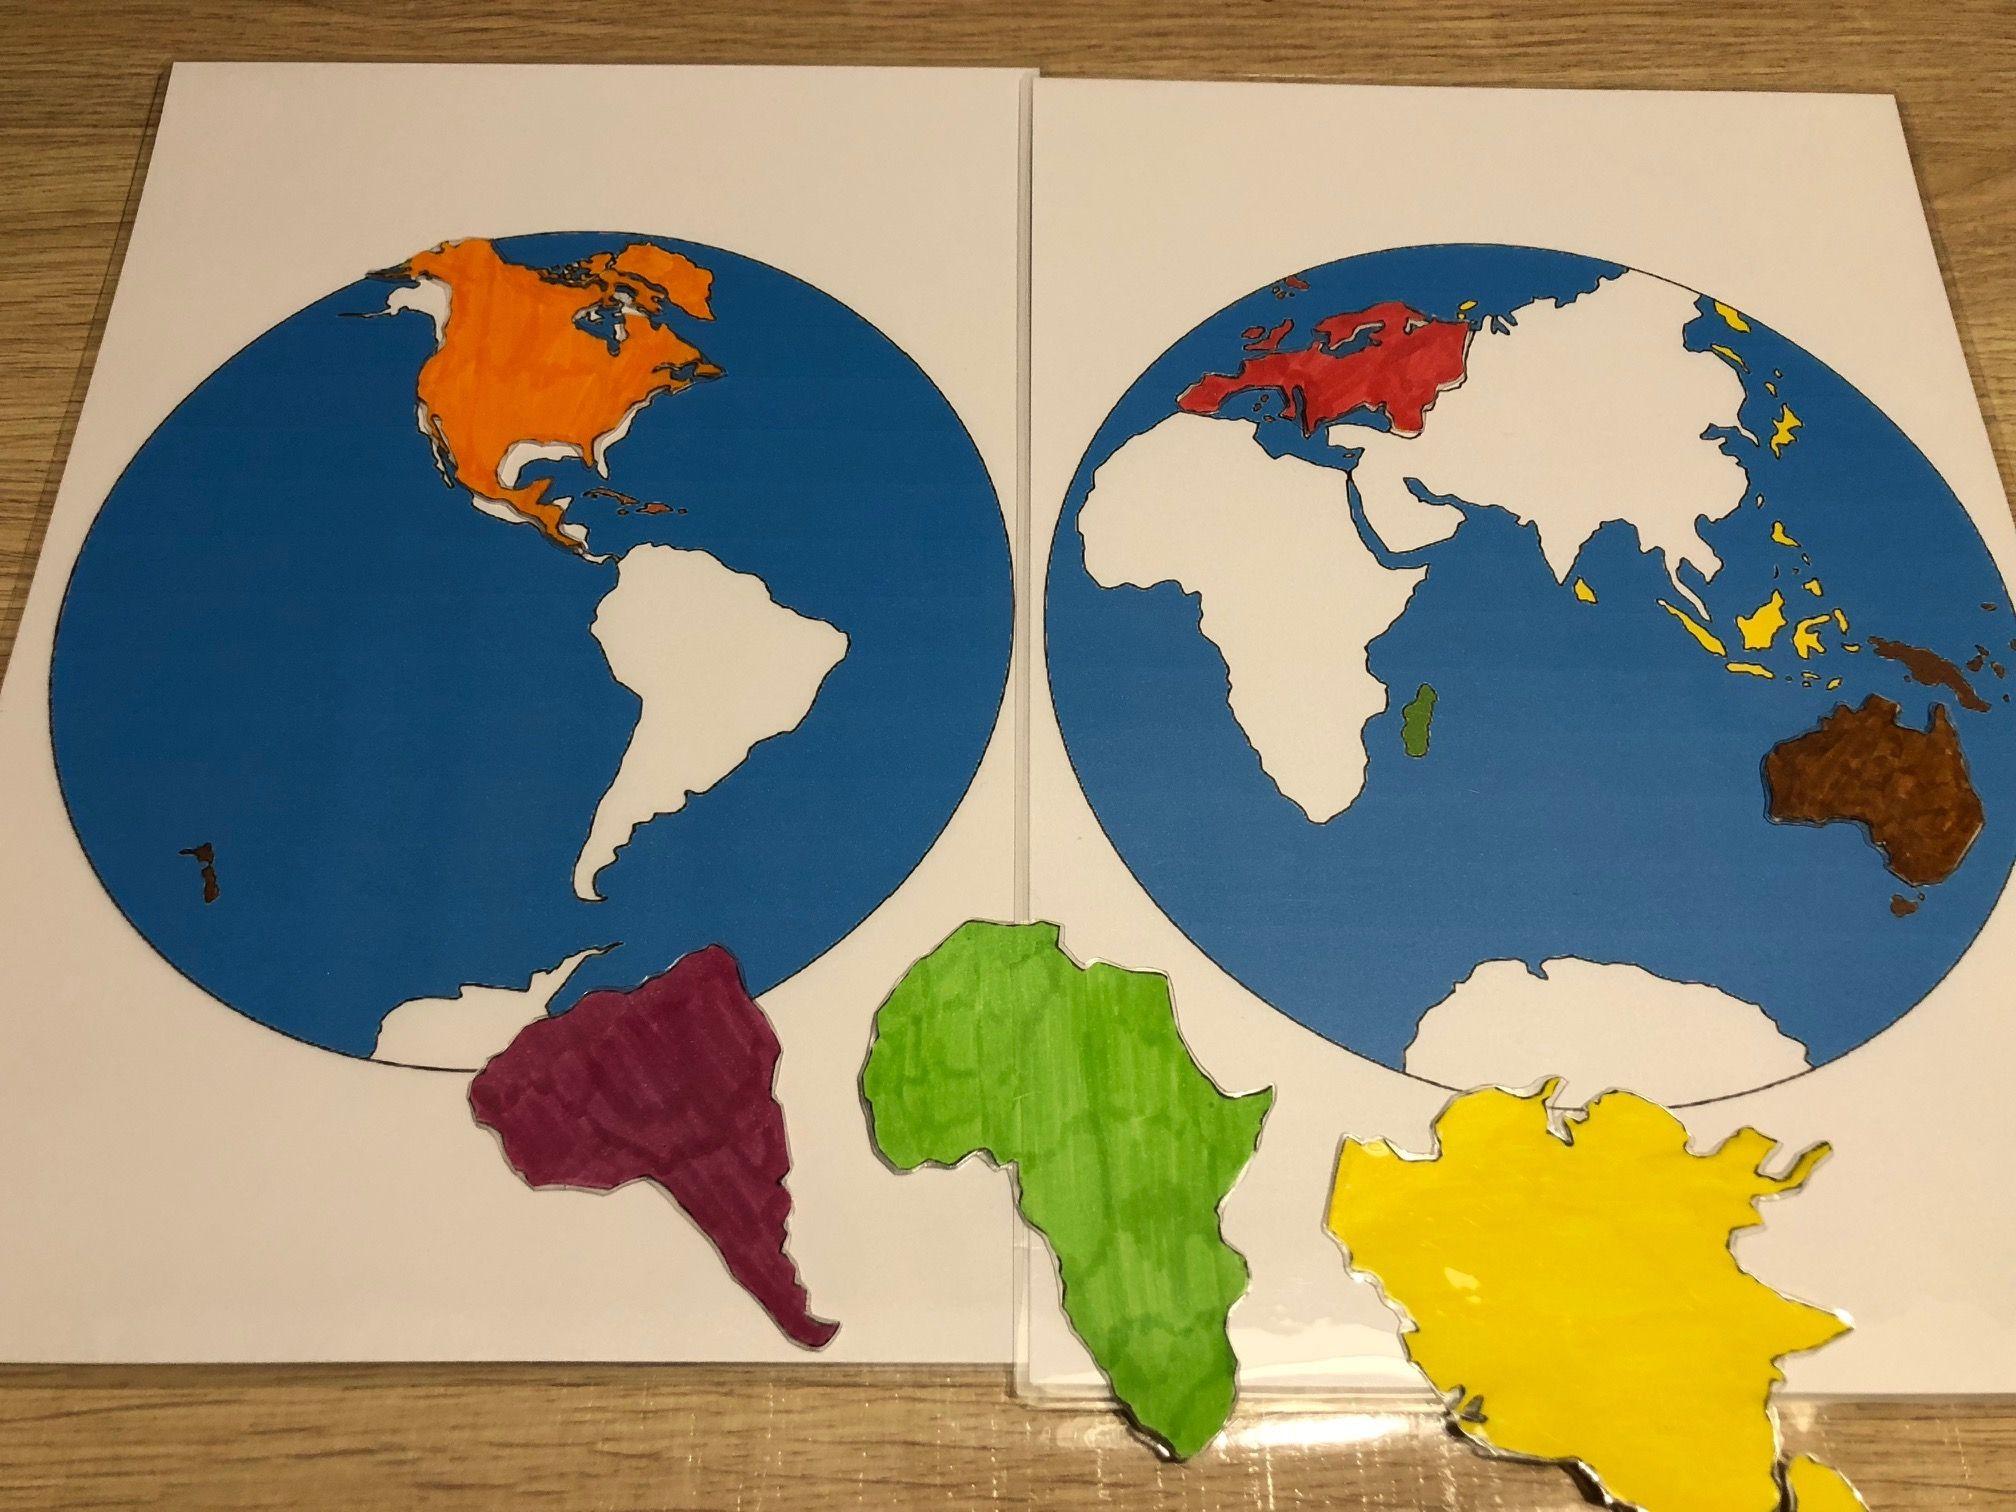 "Sympa 6/"" GLOBE TERRESTRE carte avec Continents Pays des Océans Animaux-Neuf"